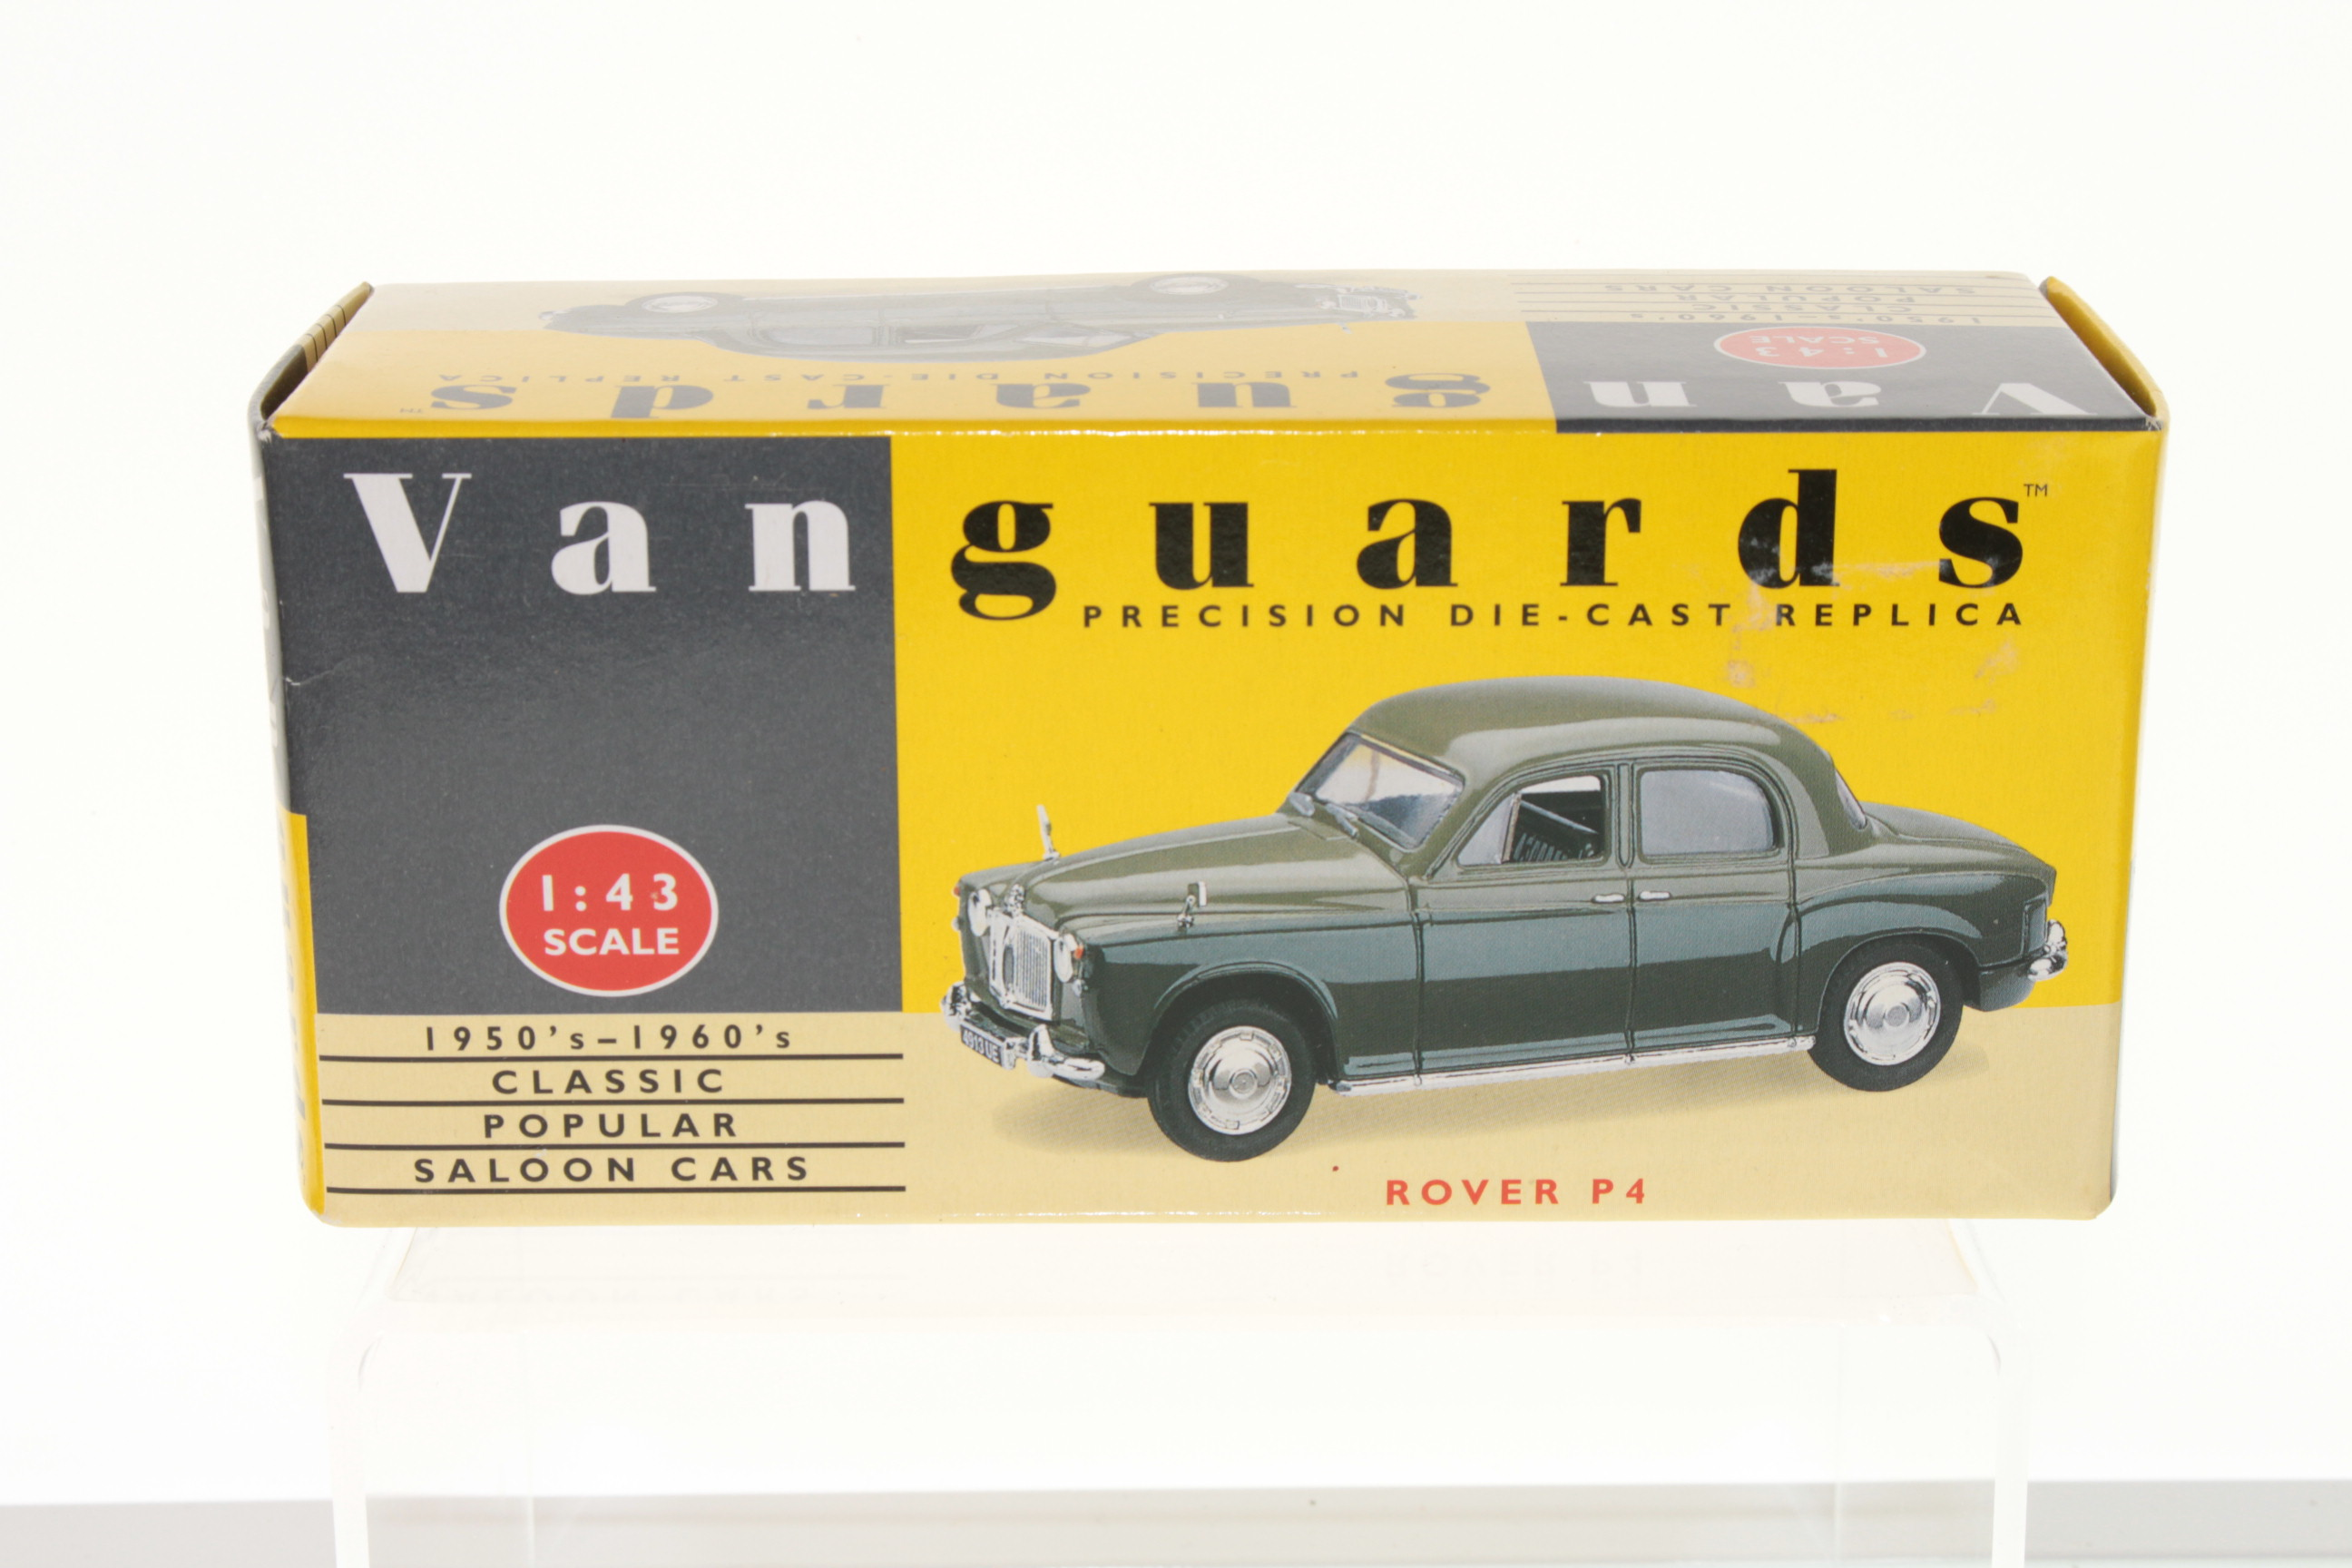 Vanguards VA19007, Rover P4 - Free Price Guide & Review